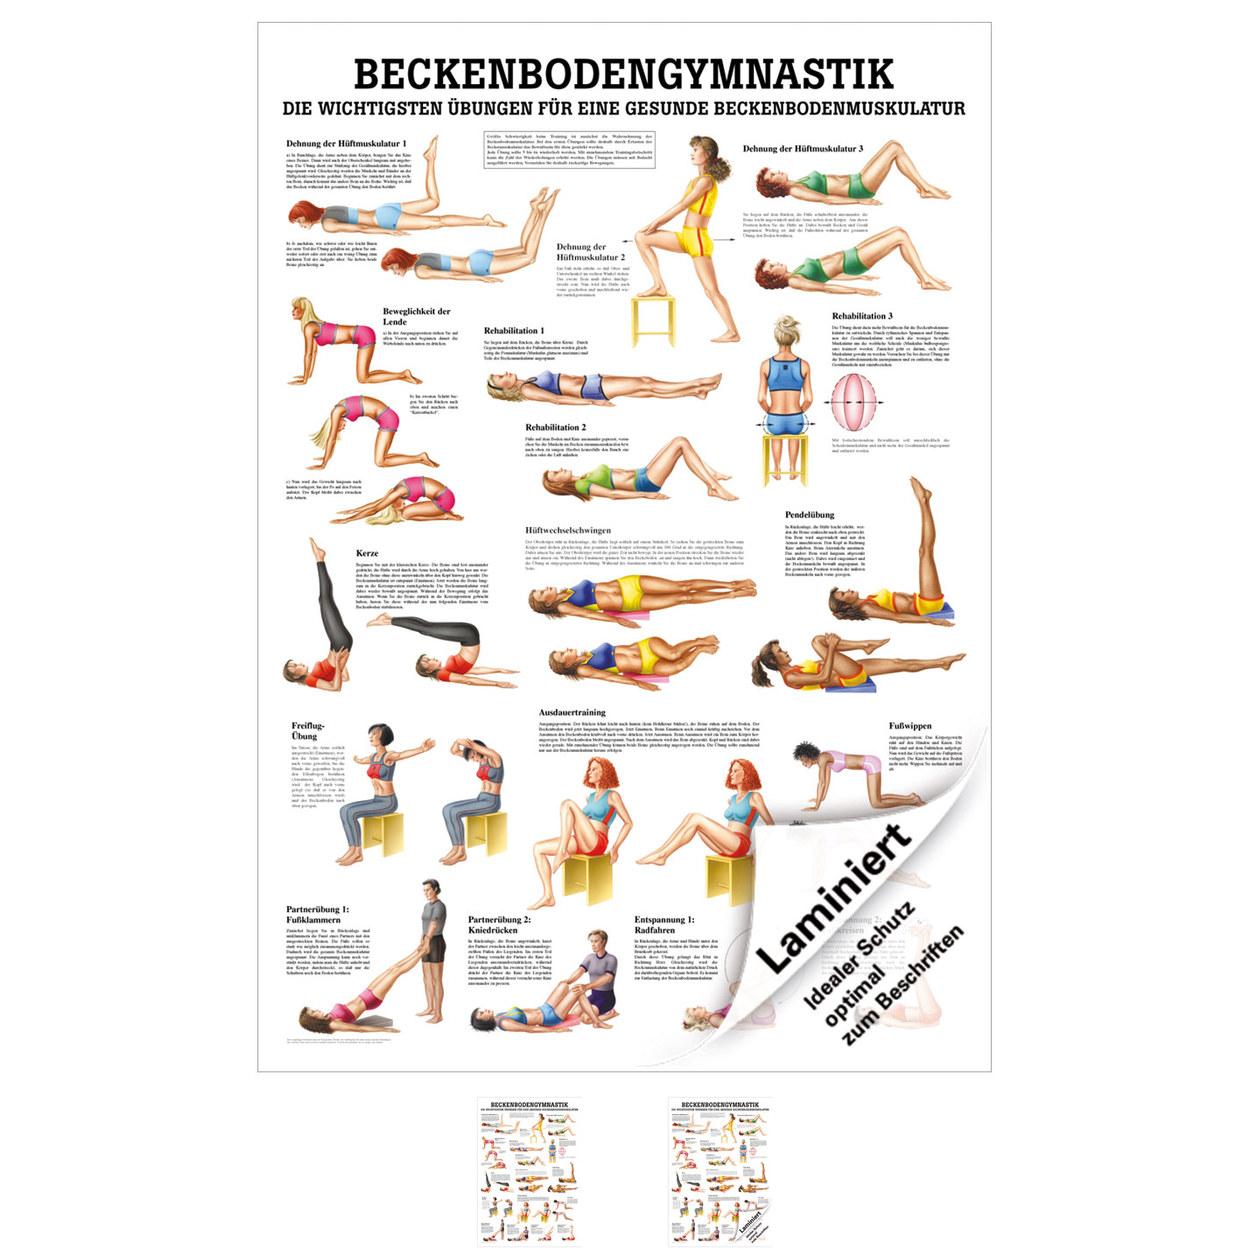 Beckenbodengymnastik Mini-Poster Anatomie 34x24 cm medizinische ...